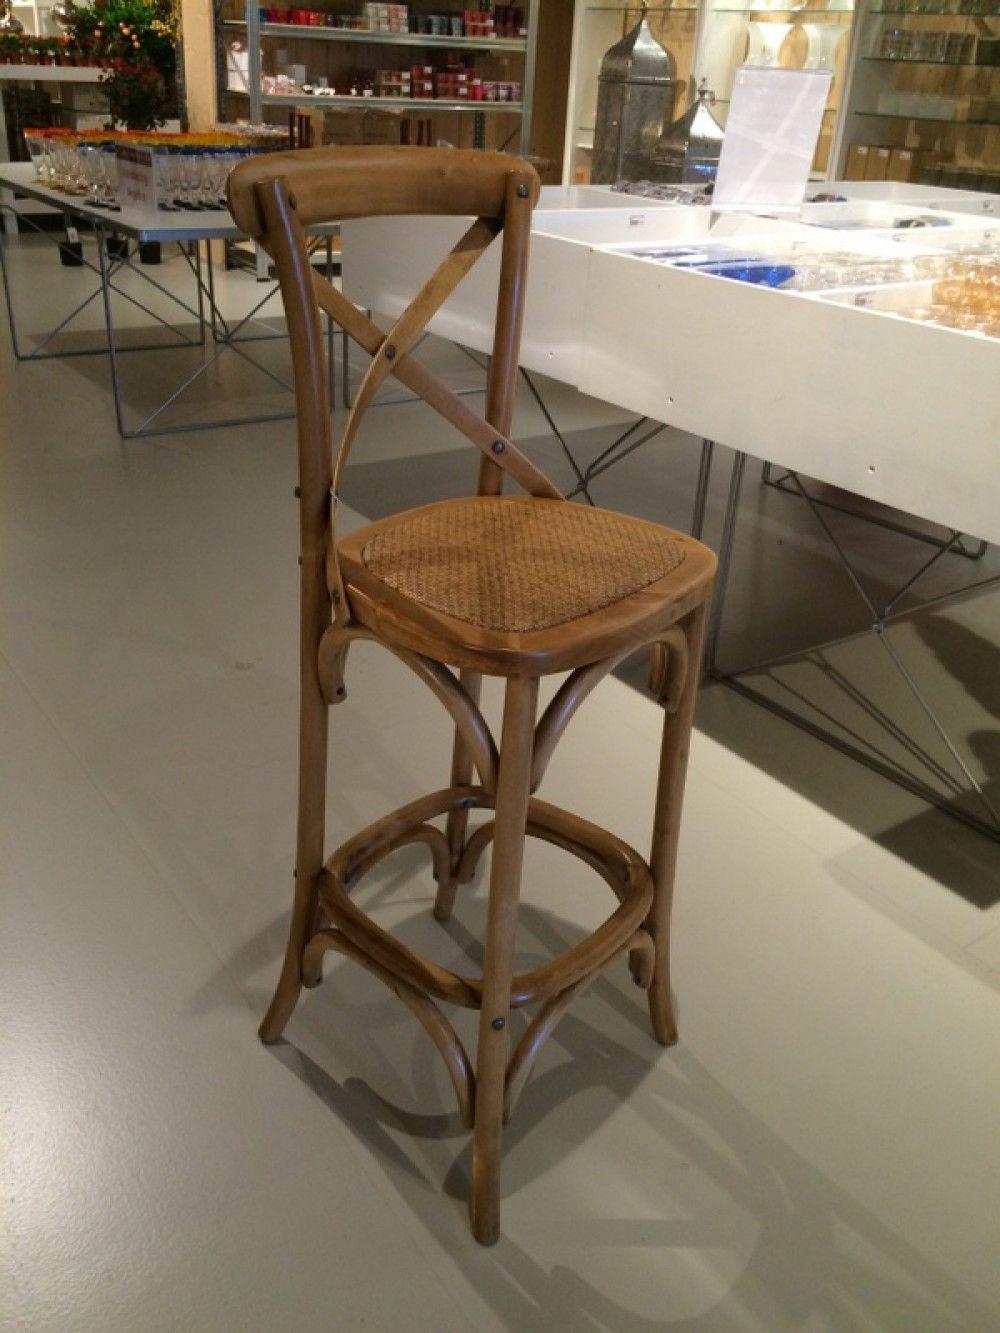 Barhocker aus Massivholz, Barstuhl, Sitzhöhe 75 cm | Barhocker ...